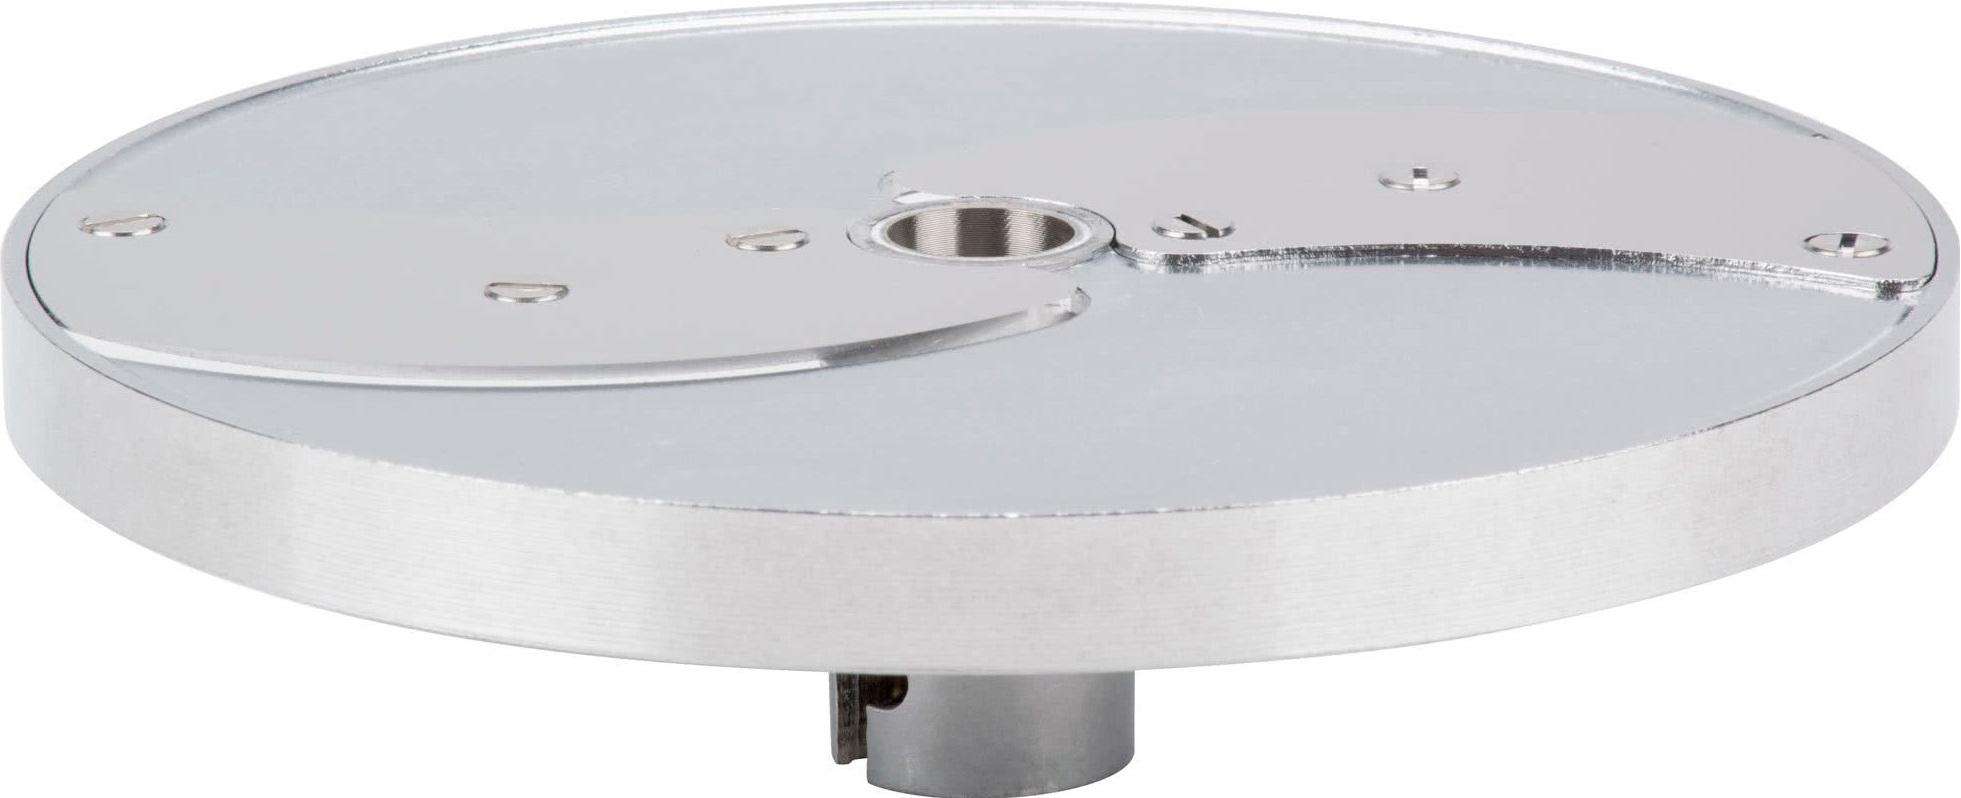 Диск-слайсер Robot Coupe 28062(1мм) - 3